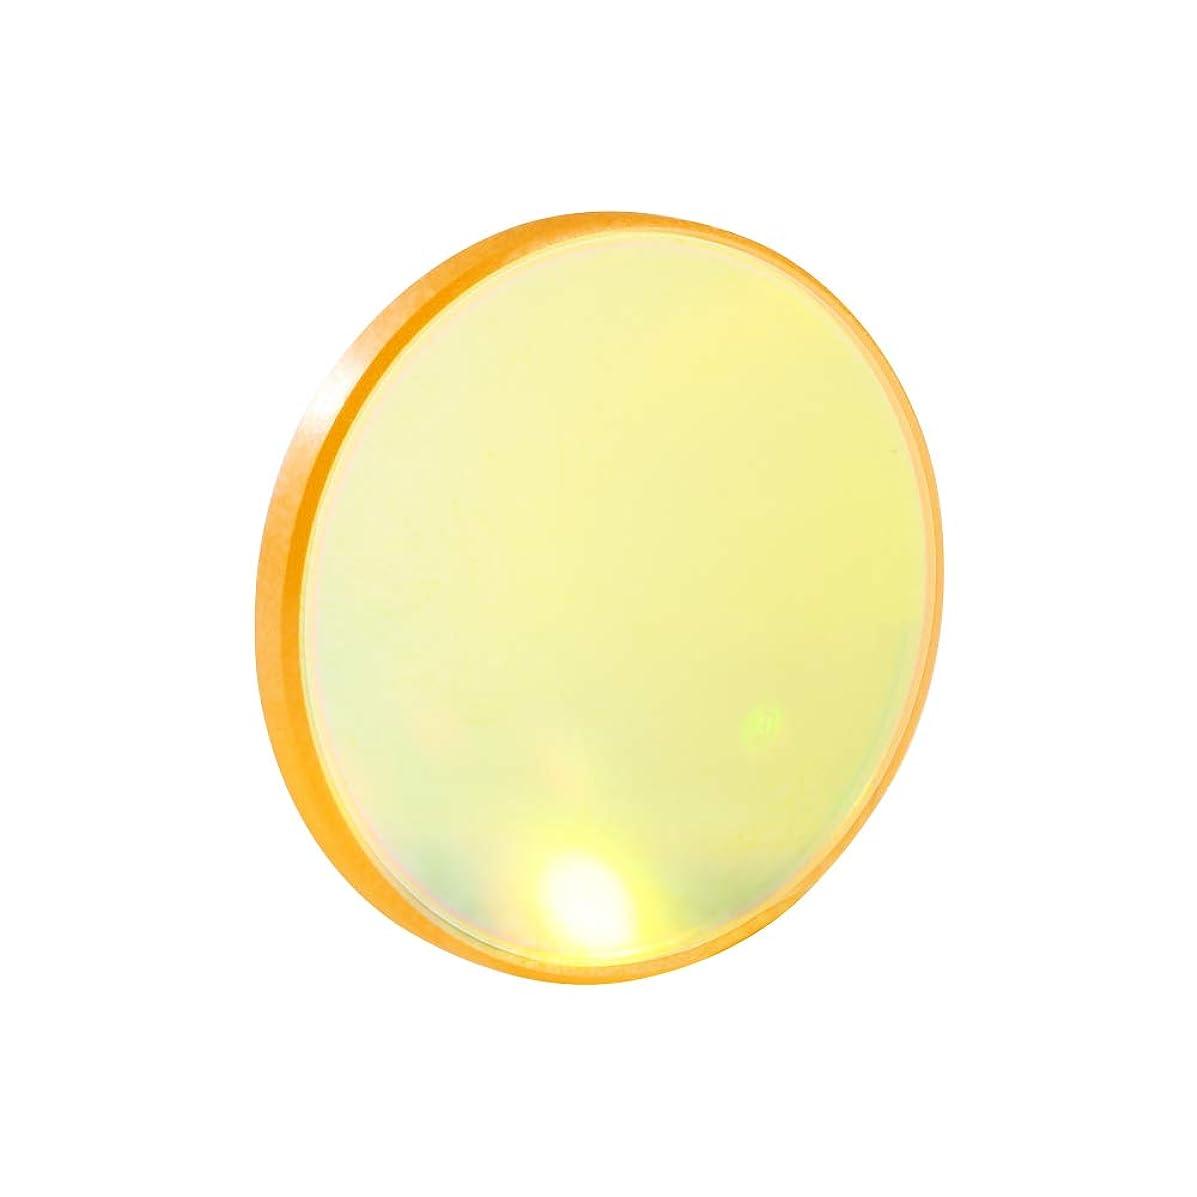 TEN-HIGH Diameter 20mm Focal Lens for CO2 Laser Cutting engraving machine, Superior transmittance materials, FL: 5